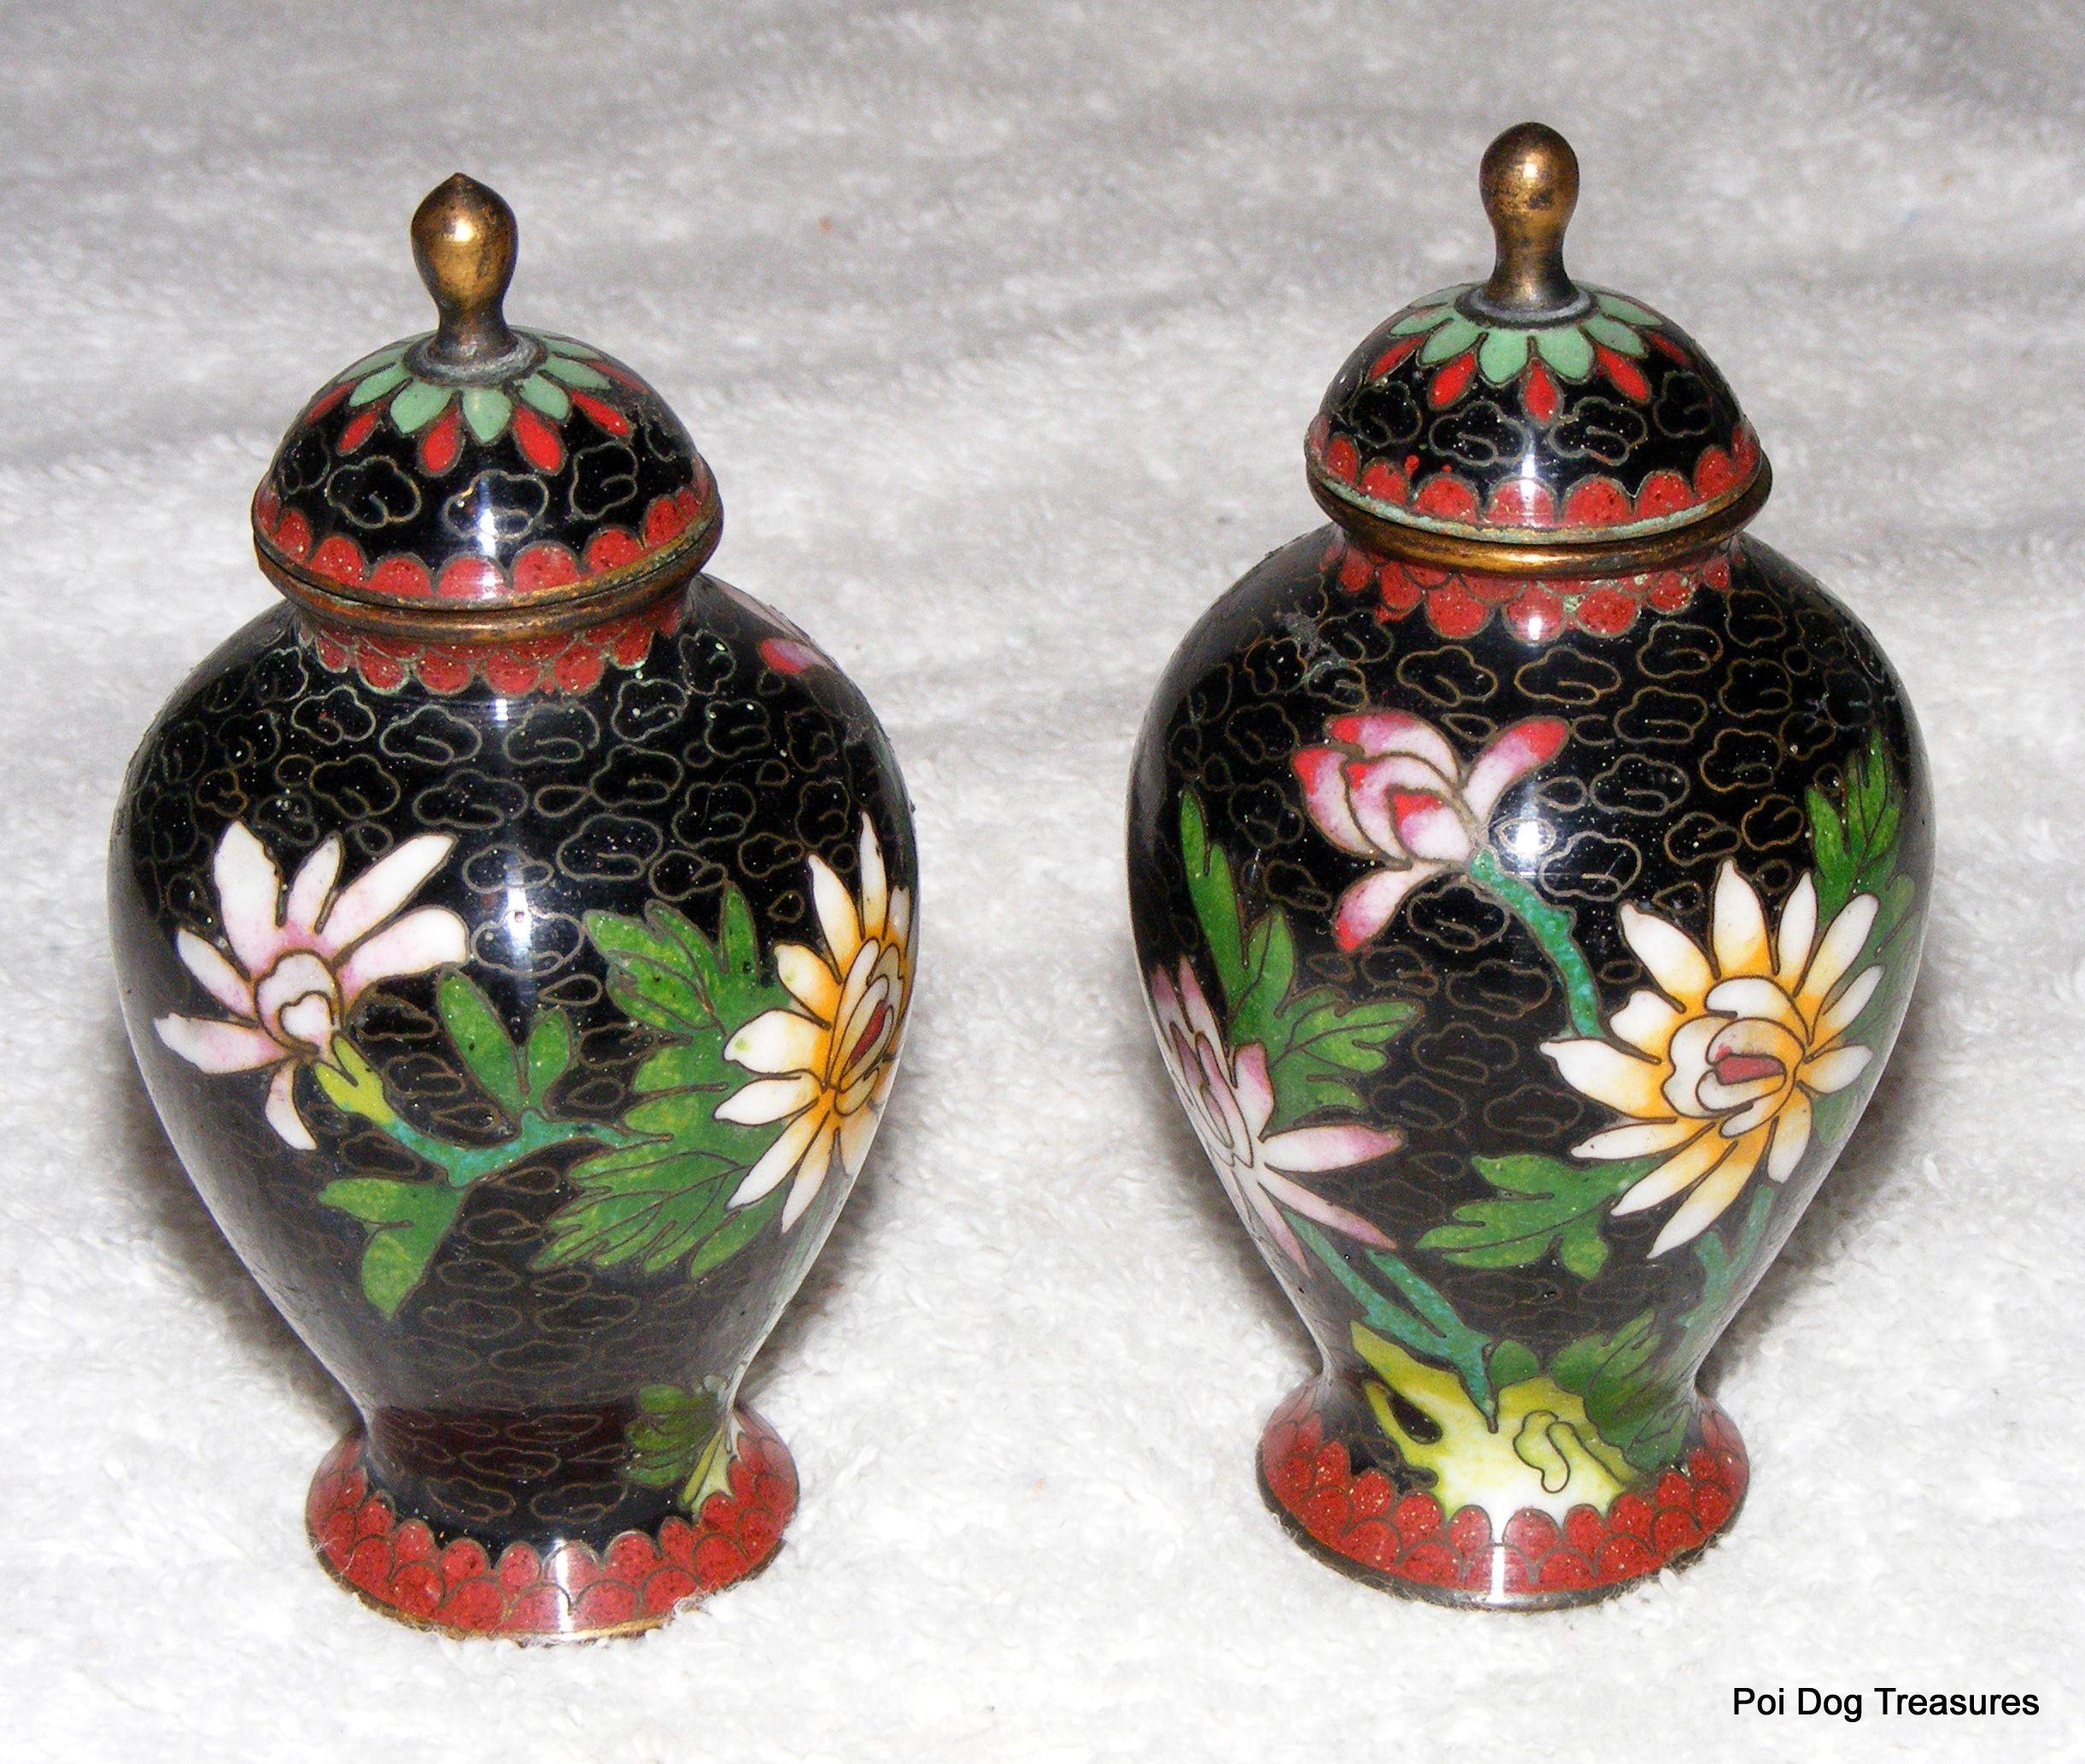 Wonderful miniature chinese cloisonne vasesurns with lids wonderful miniature chinese cloisonne vasesurns with lids reviewsmspy